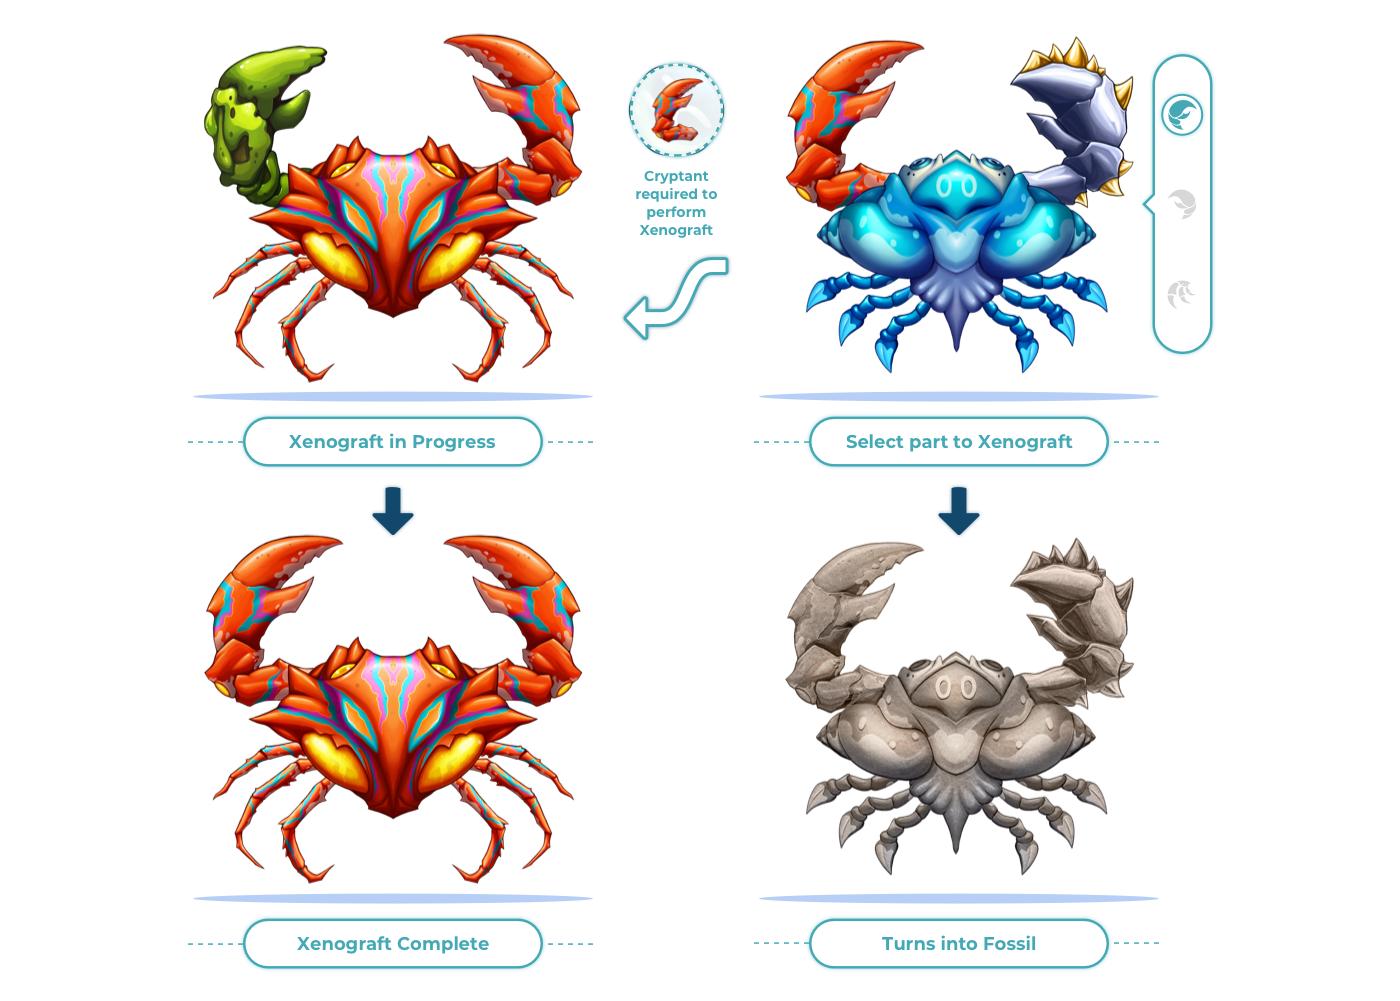 Cryptant Crab, iCandy Interactive, Blockchain Game, Cryptocurrency, Pre-Sale, Xenograft, Ethereum